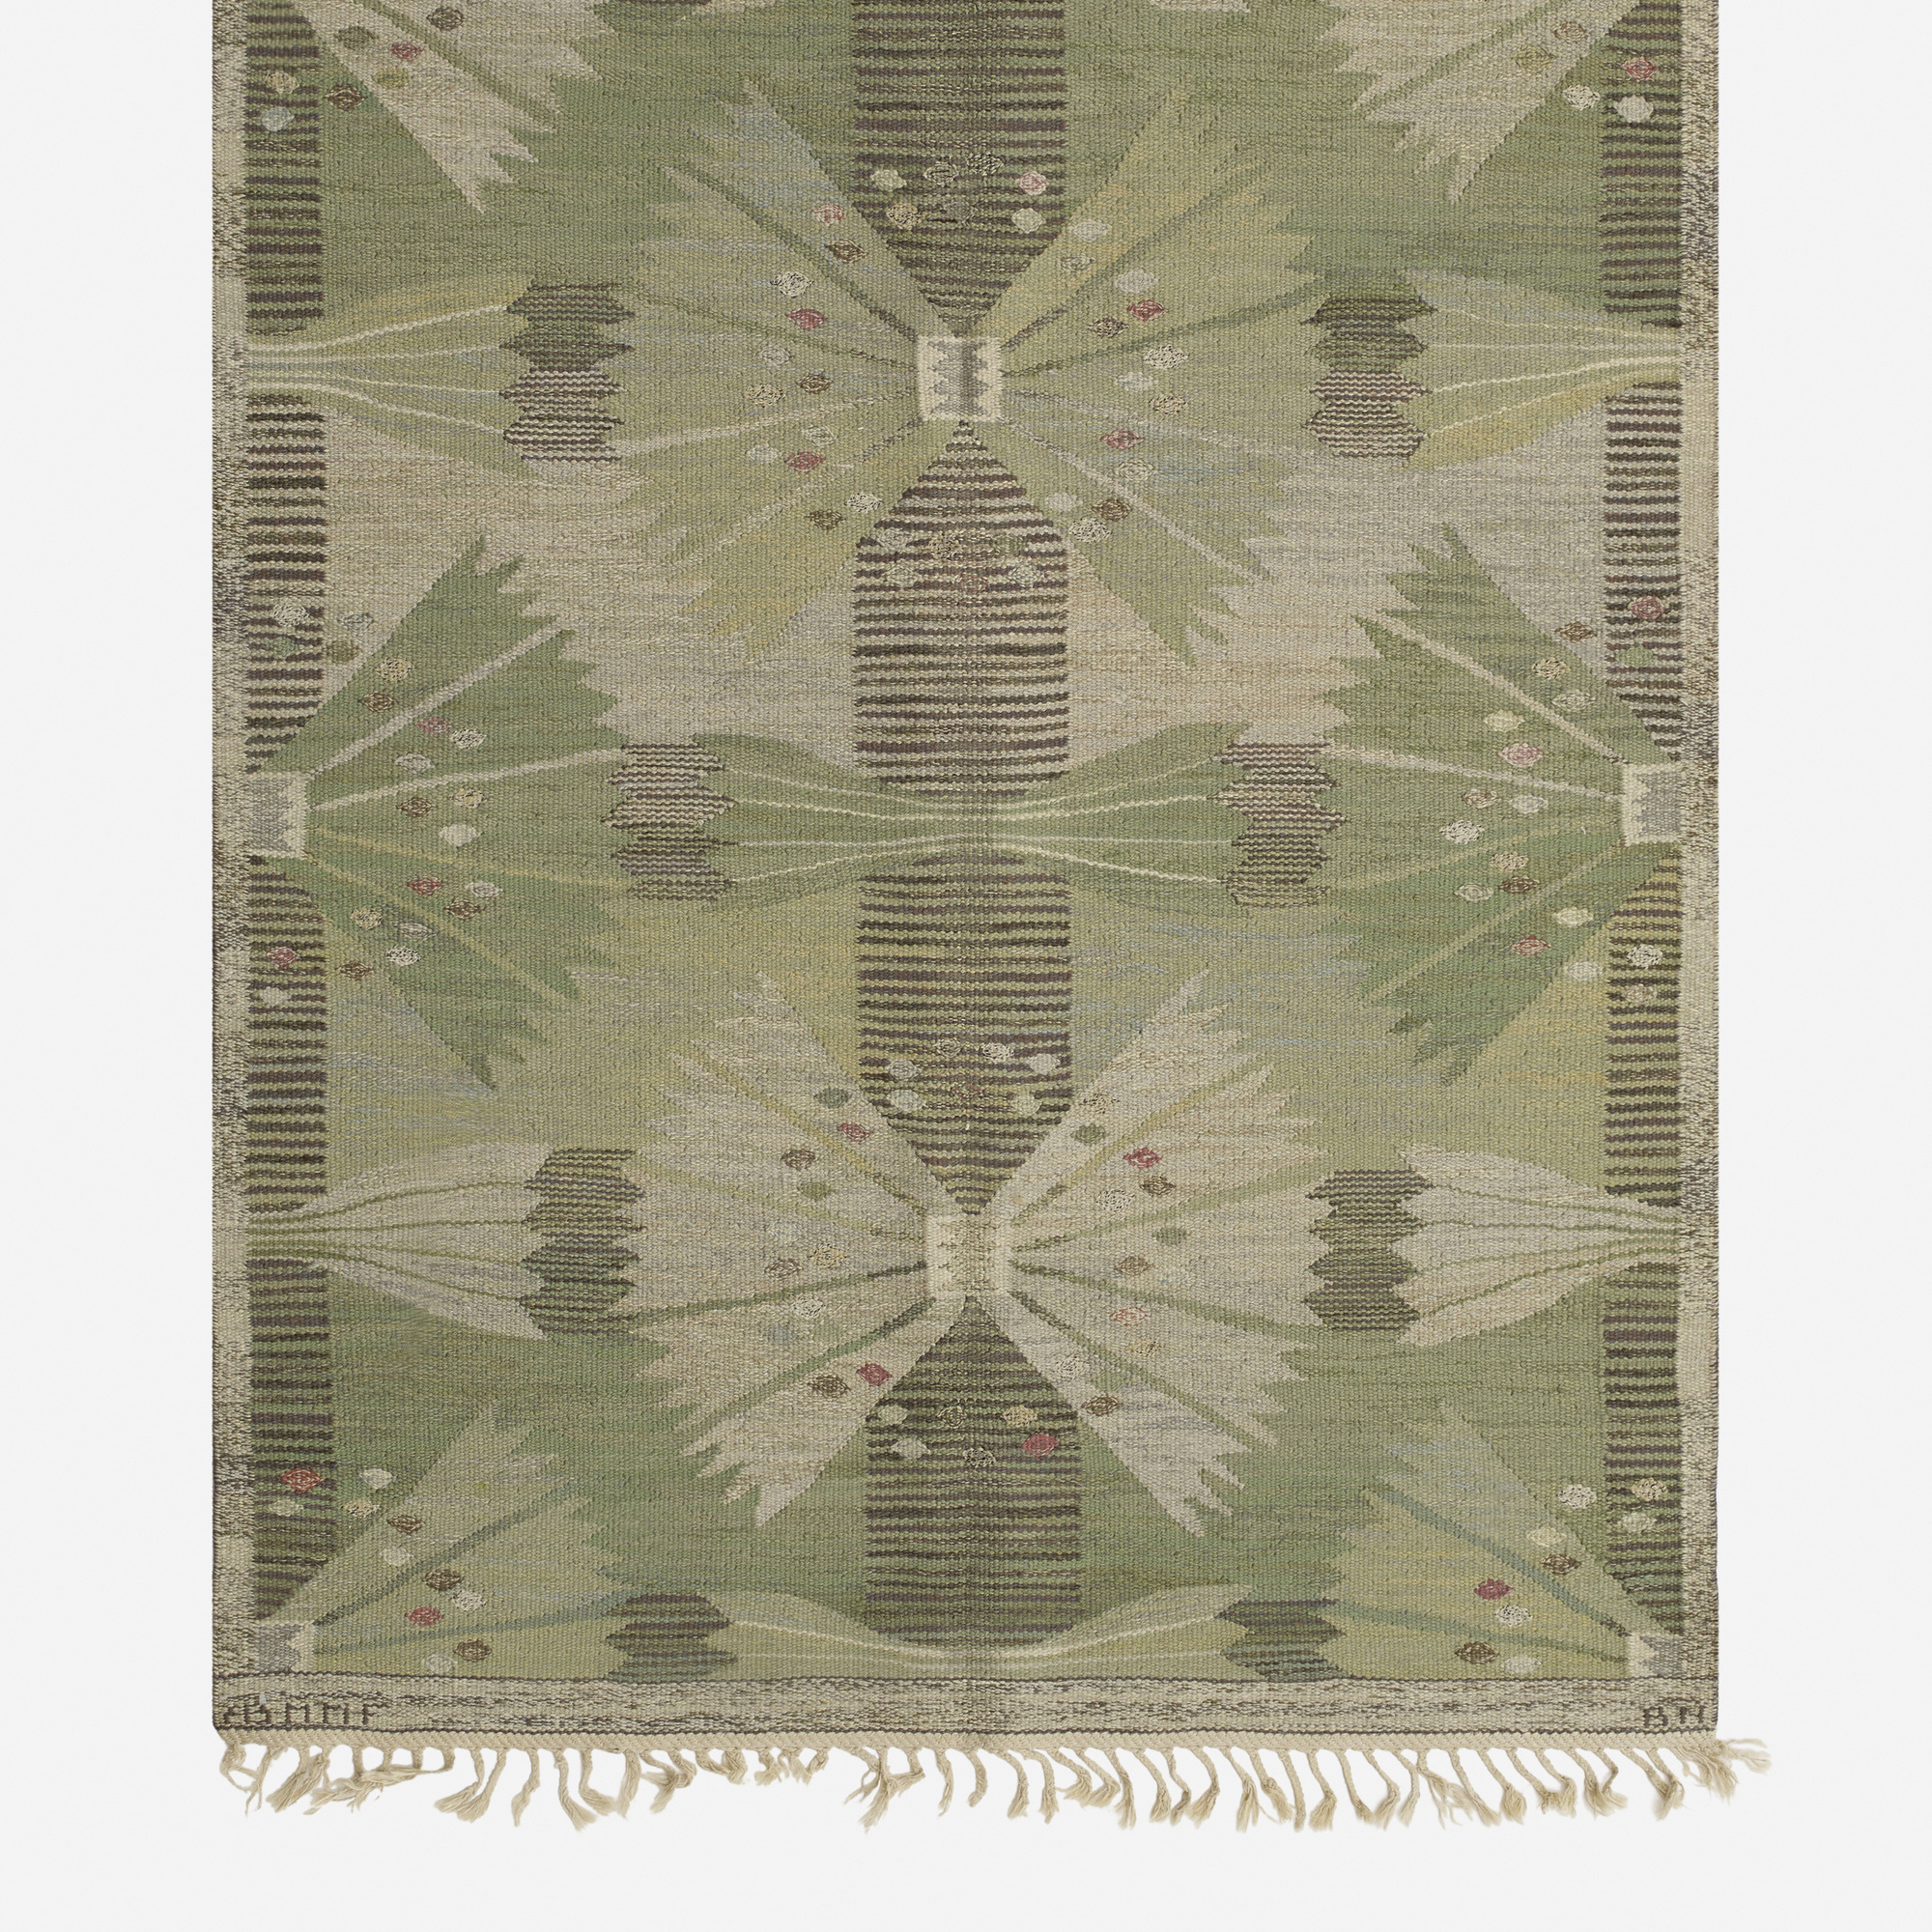 113: Barbro Nilsson / The Park, Falkman tapestry weave carpet (2 of 2)